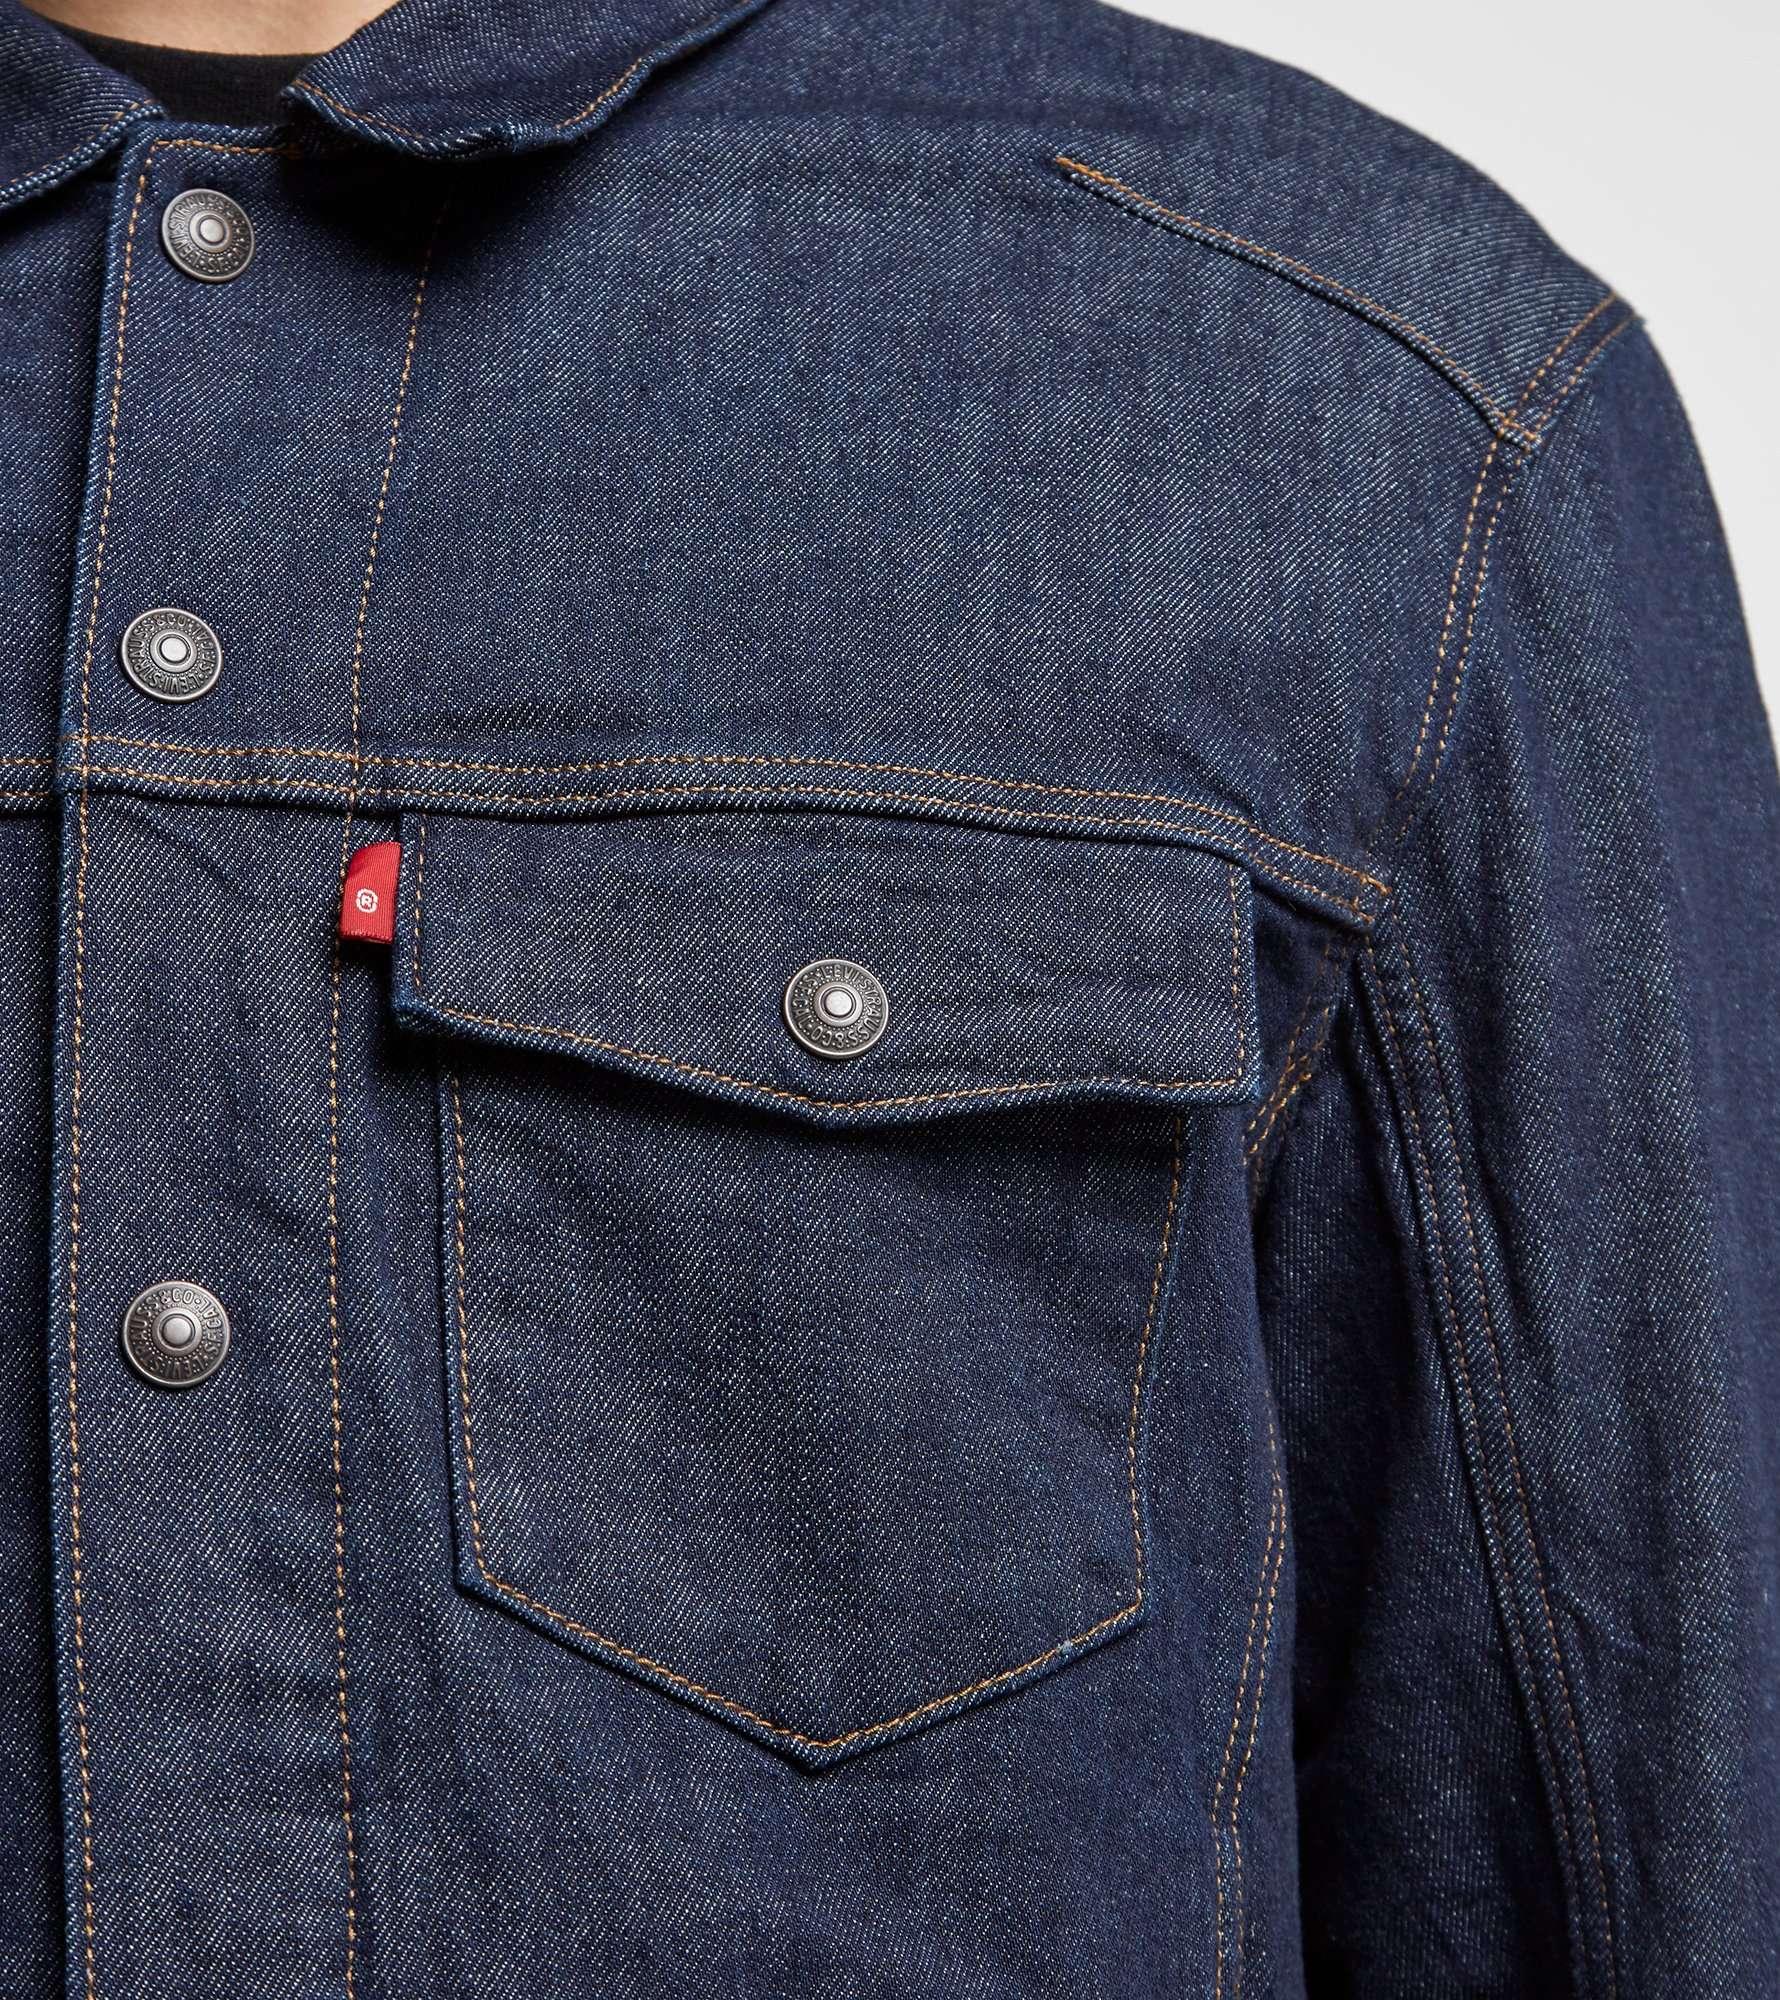 Levis Engineered Jeans Trucker Jacket